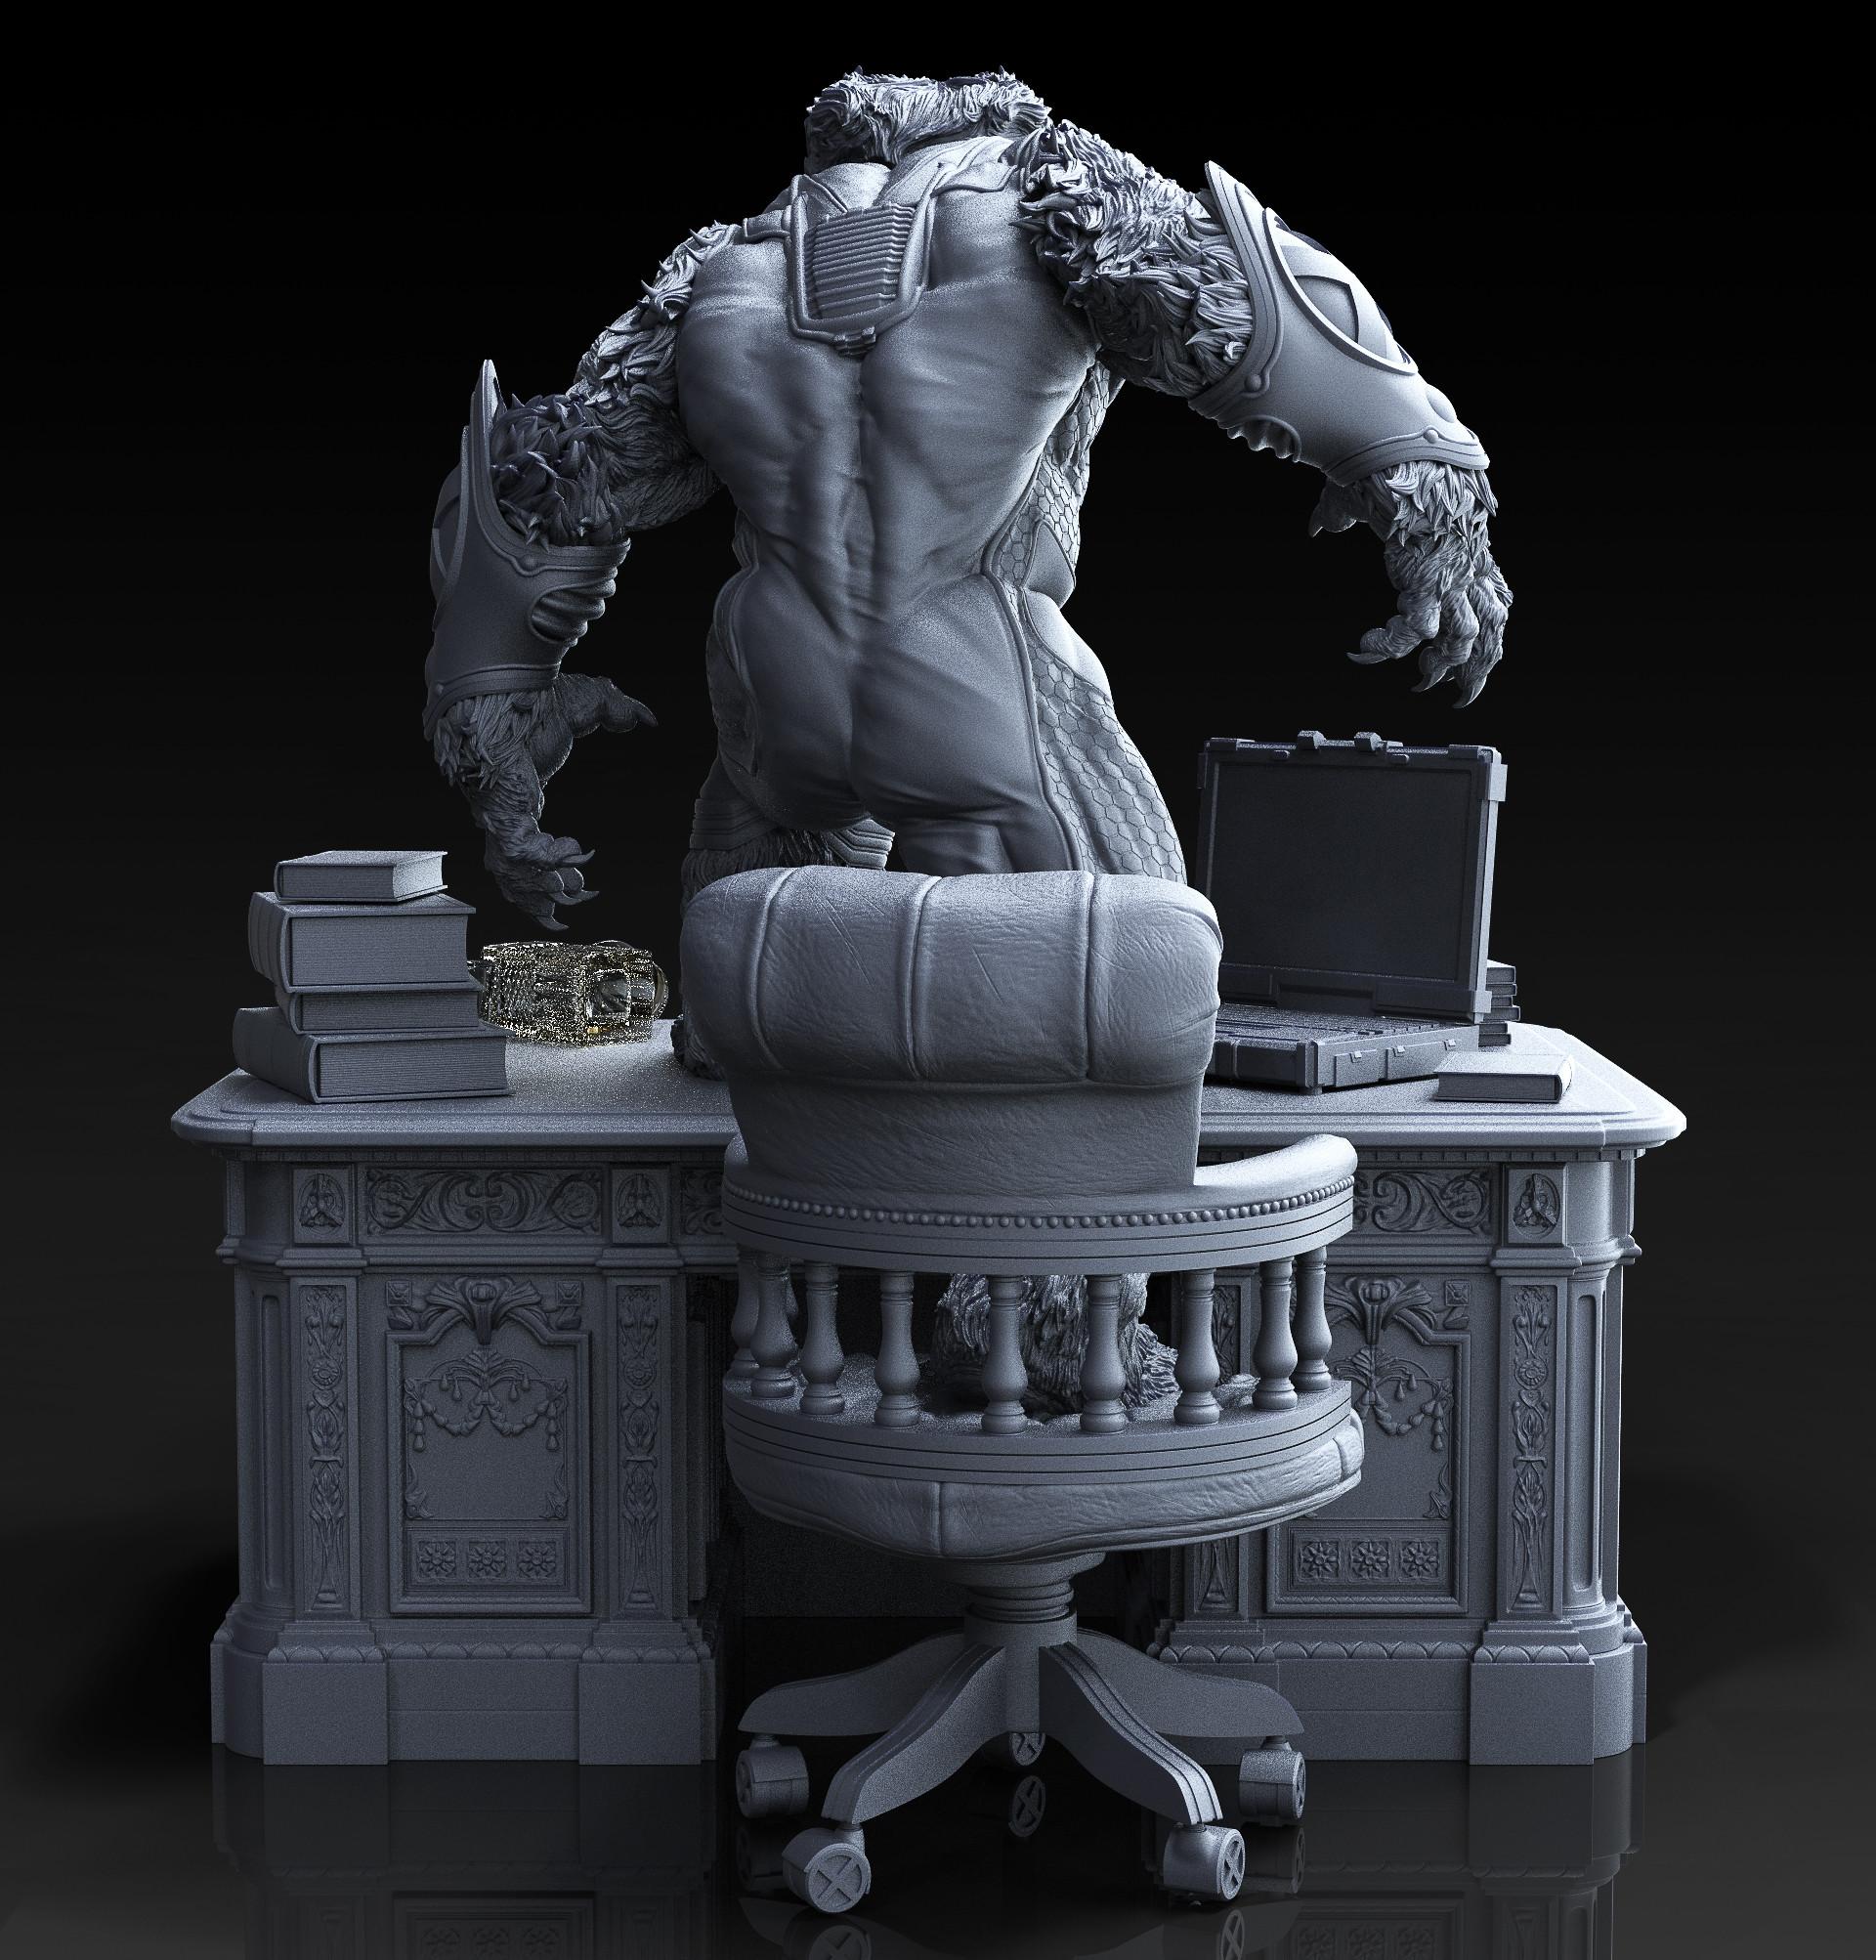 Sheridan doose spawningpoolstudios beast 05